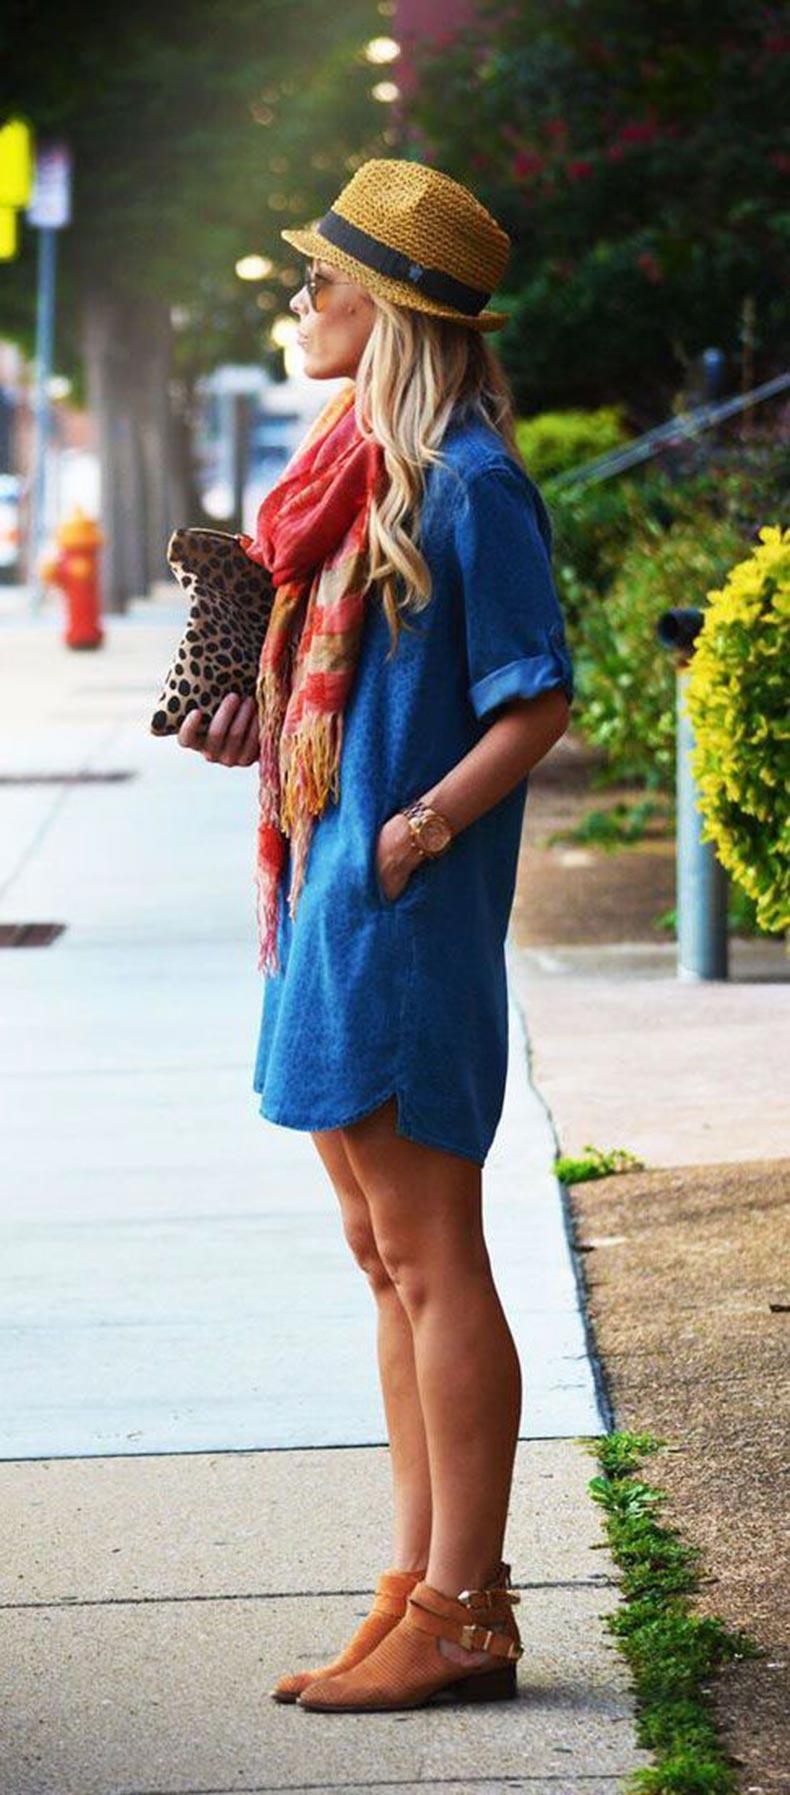 Shirtdresses-Street-Style-12